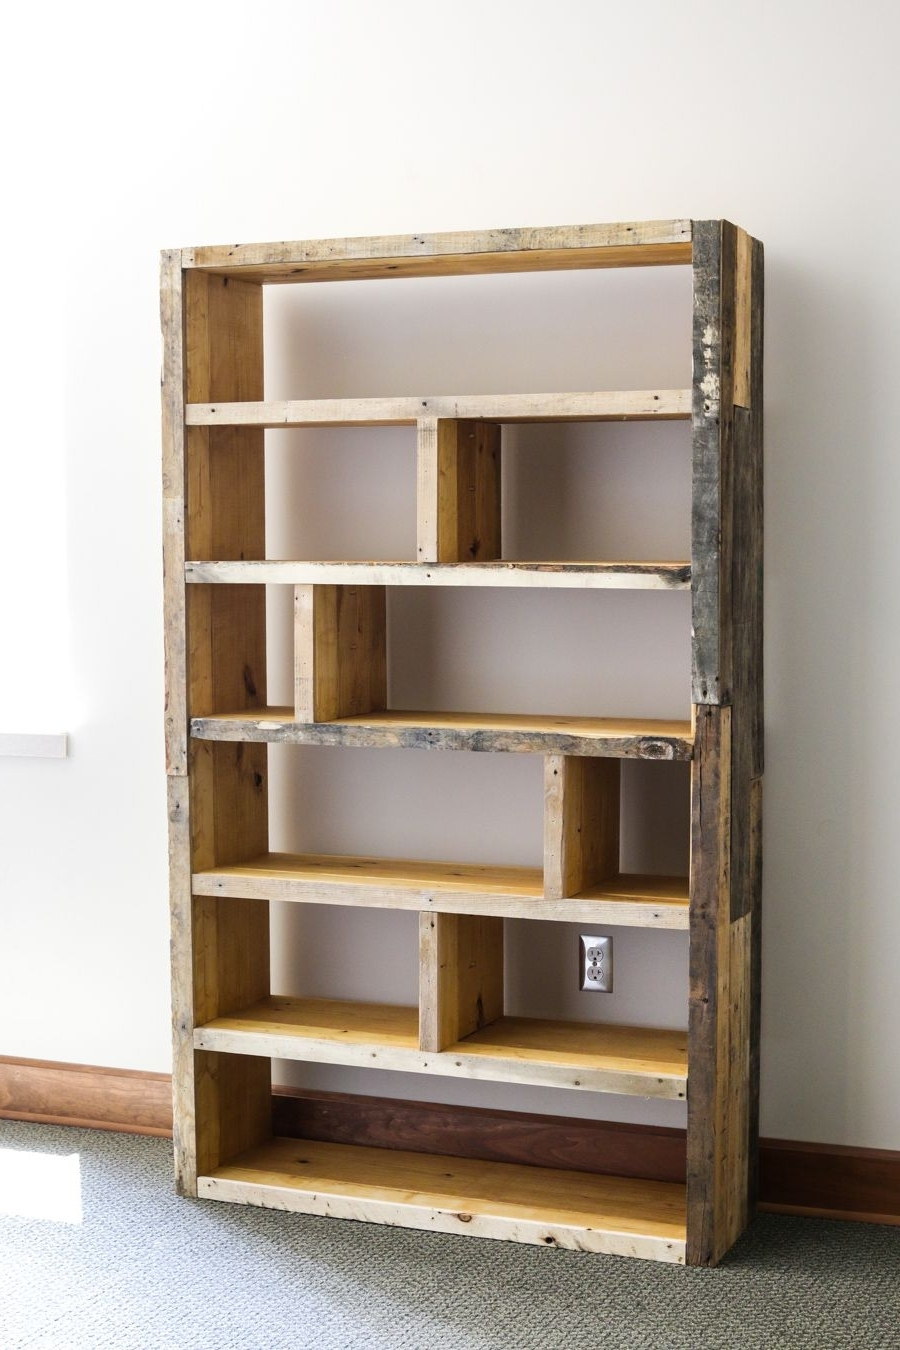 Diy Rustic Pallet Bookshelf (View 3 of 15)